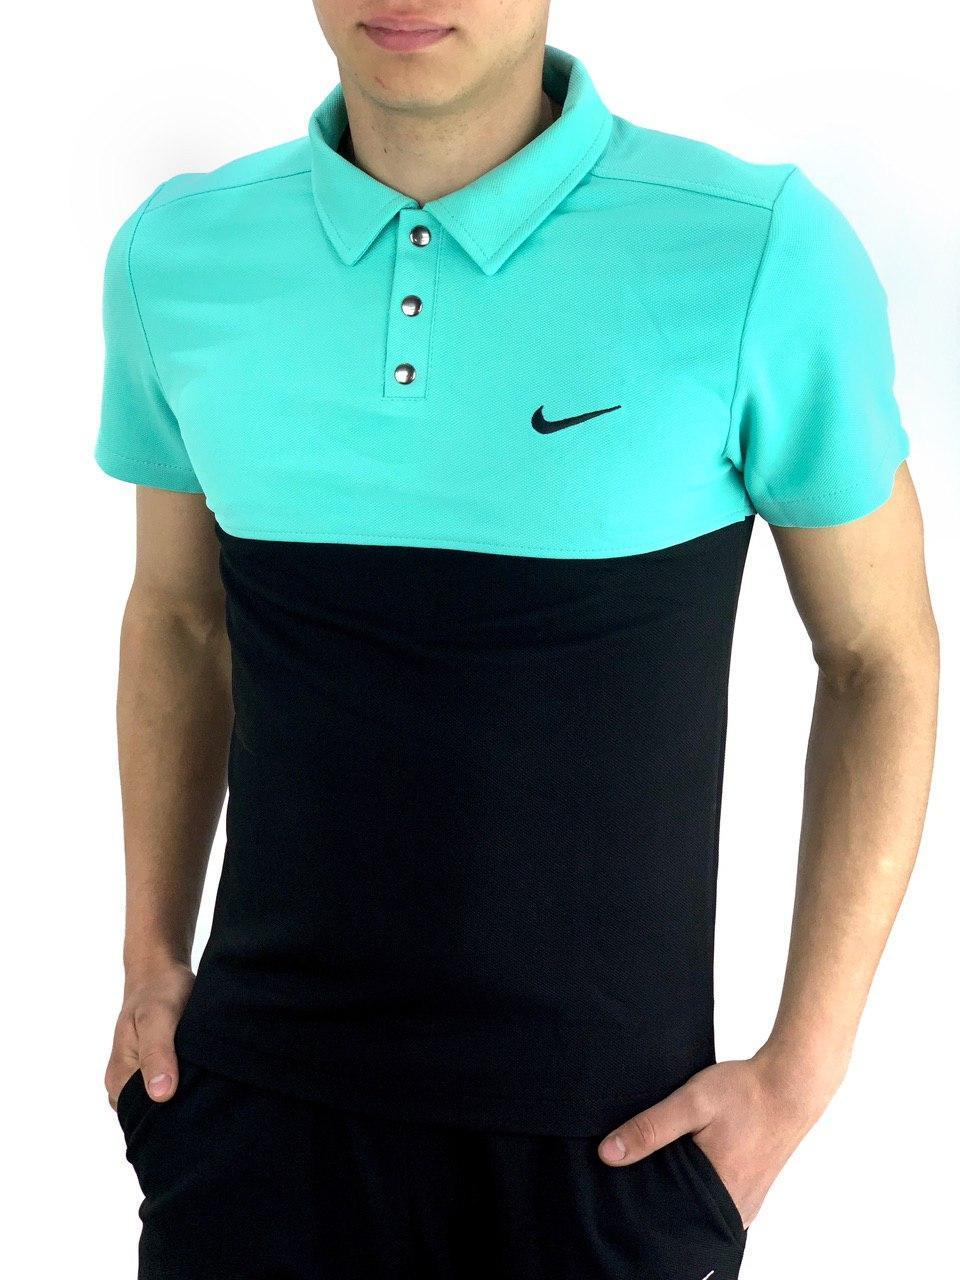 Футболка Поло Мужская черная-бирюзовая в стиле Nike (Найк)